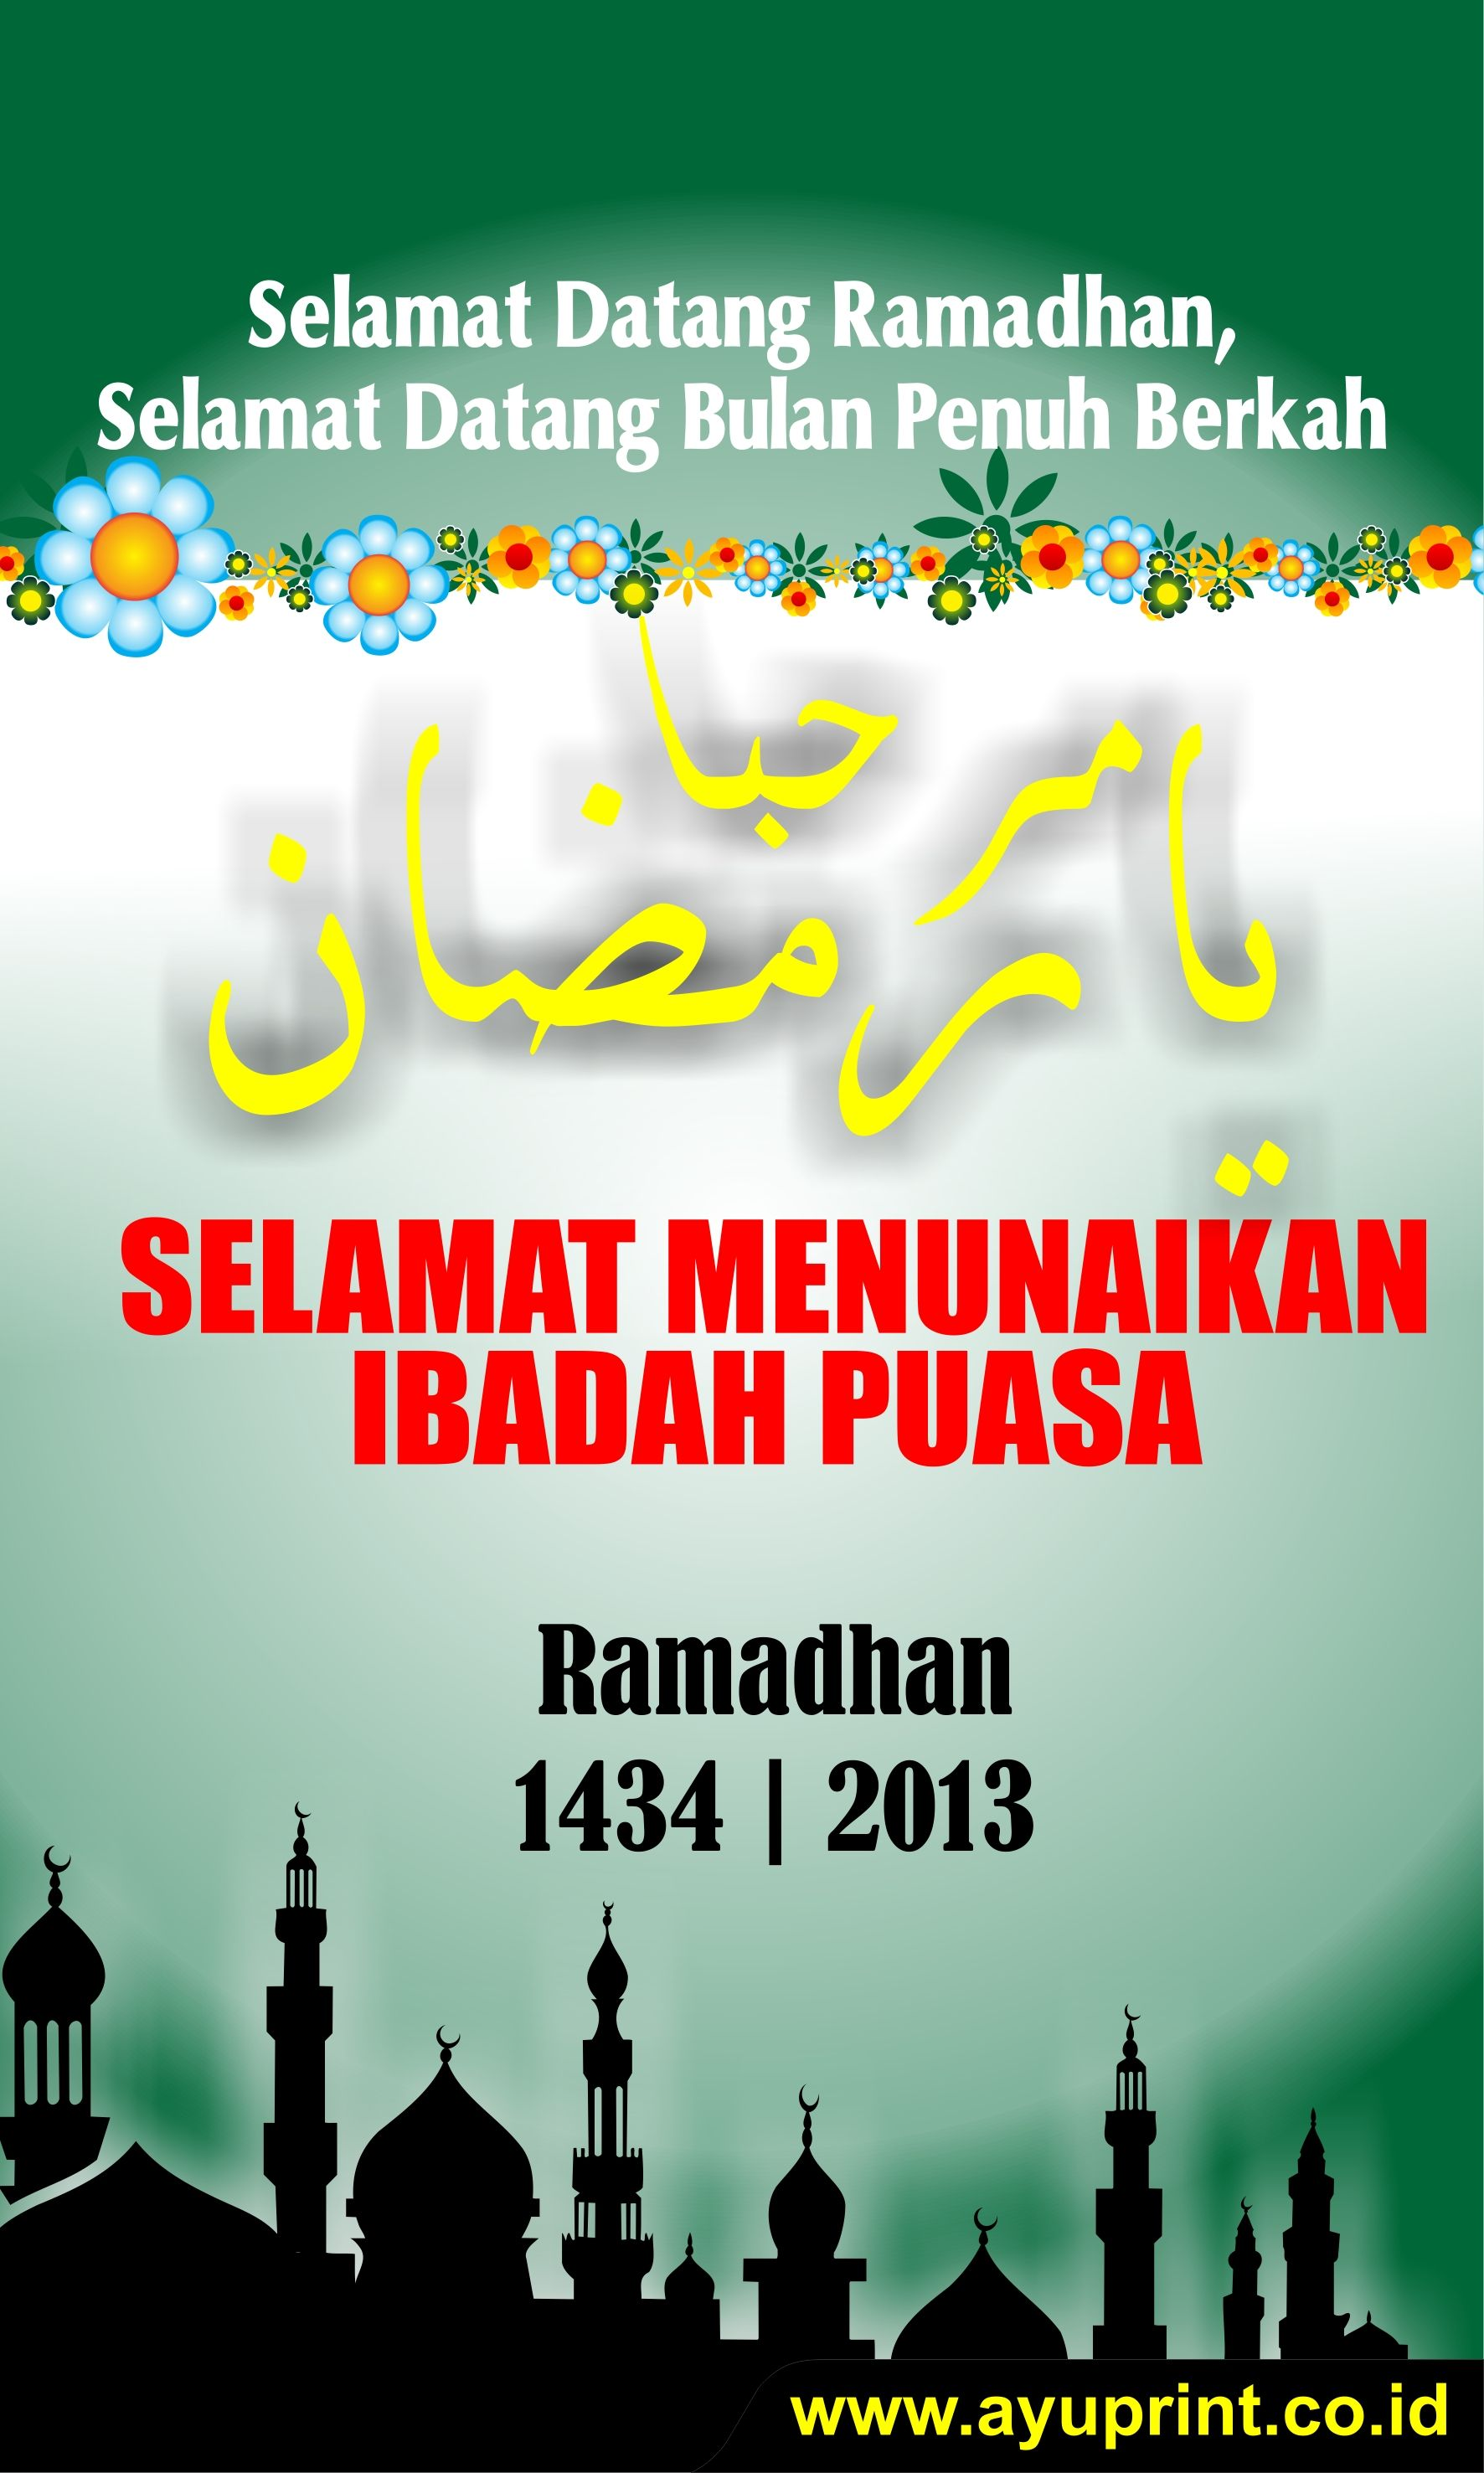 Download Gratis Desain Spanduk Menyambut Ramadhan Marhaban Ya